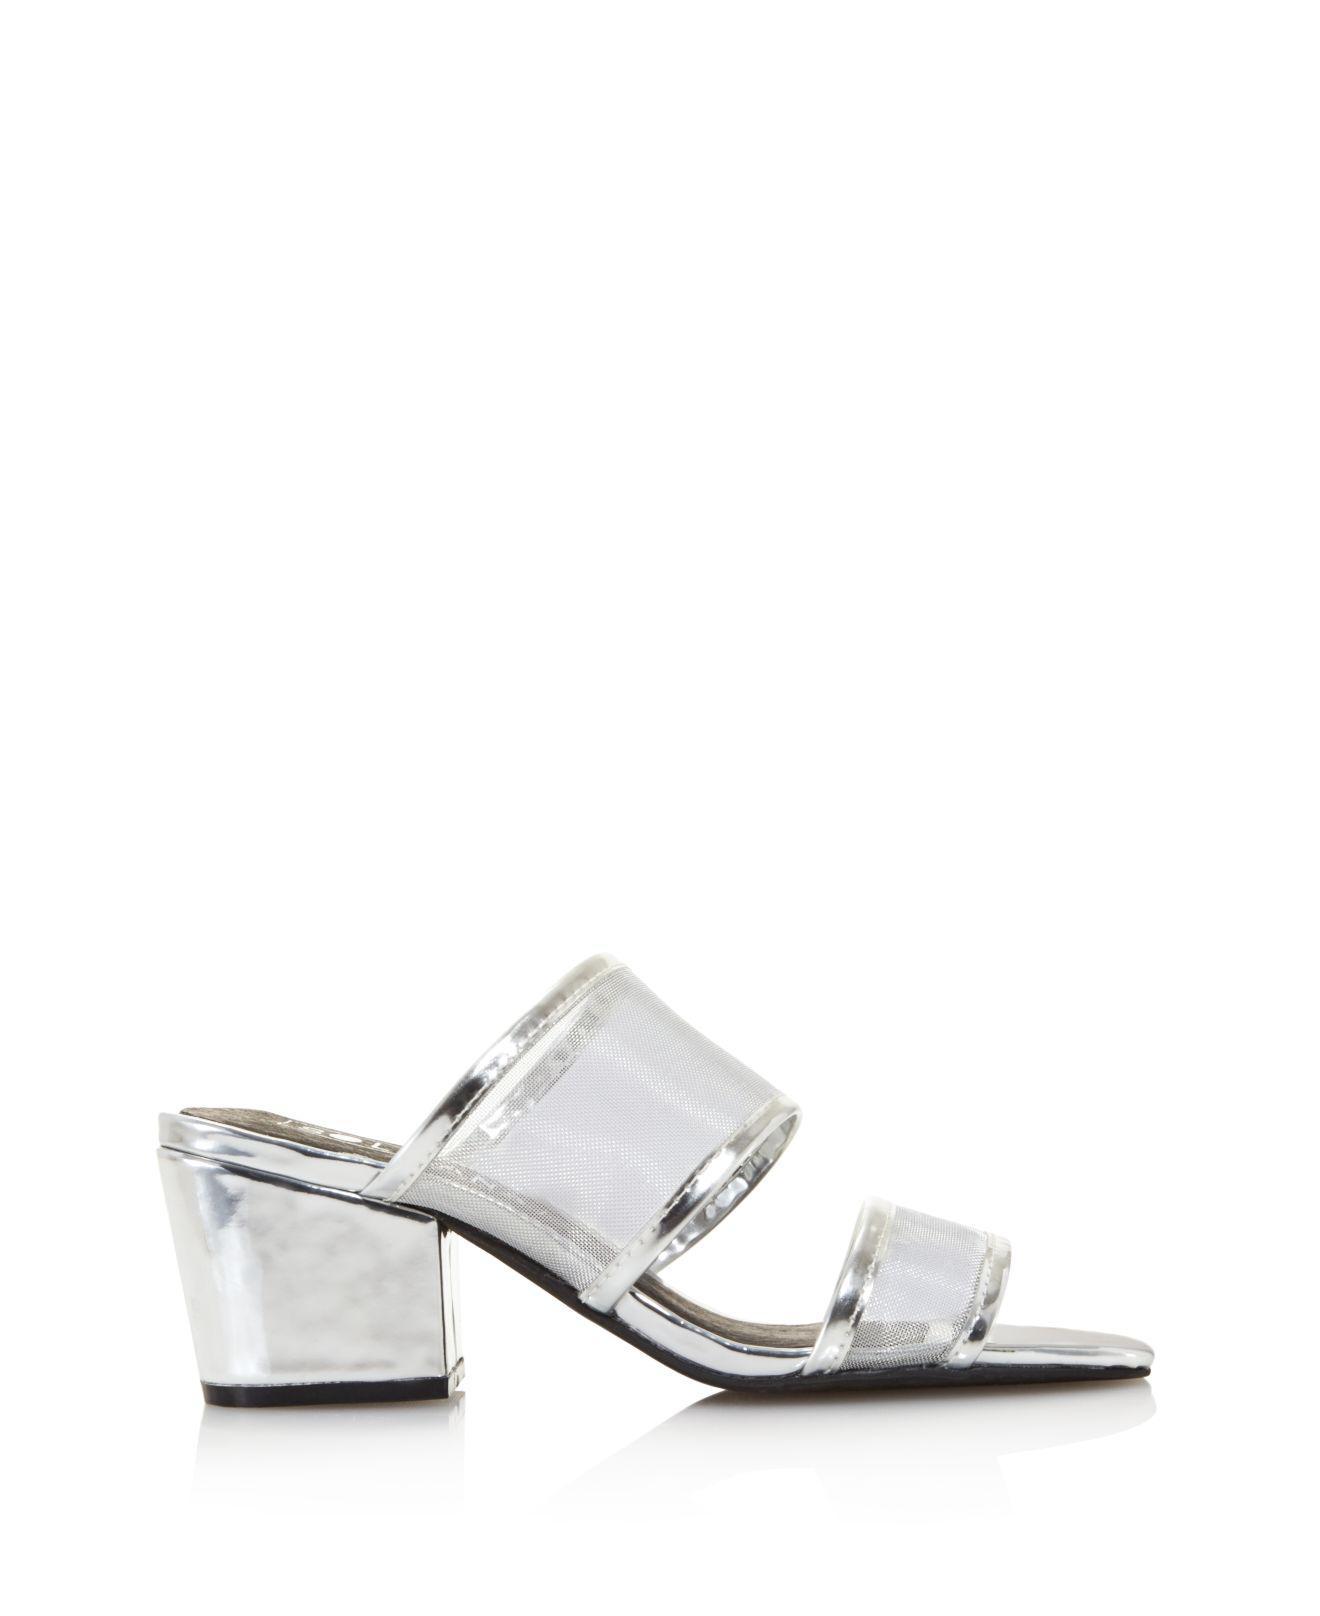 Sol Sana Women's Keira Leather & Mesh Block Heel Mules - 100% Exclusive nBXLSf5C9T